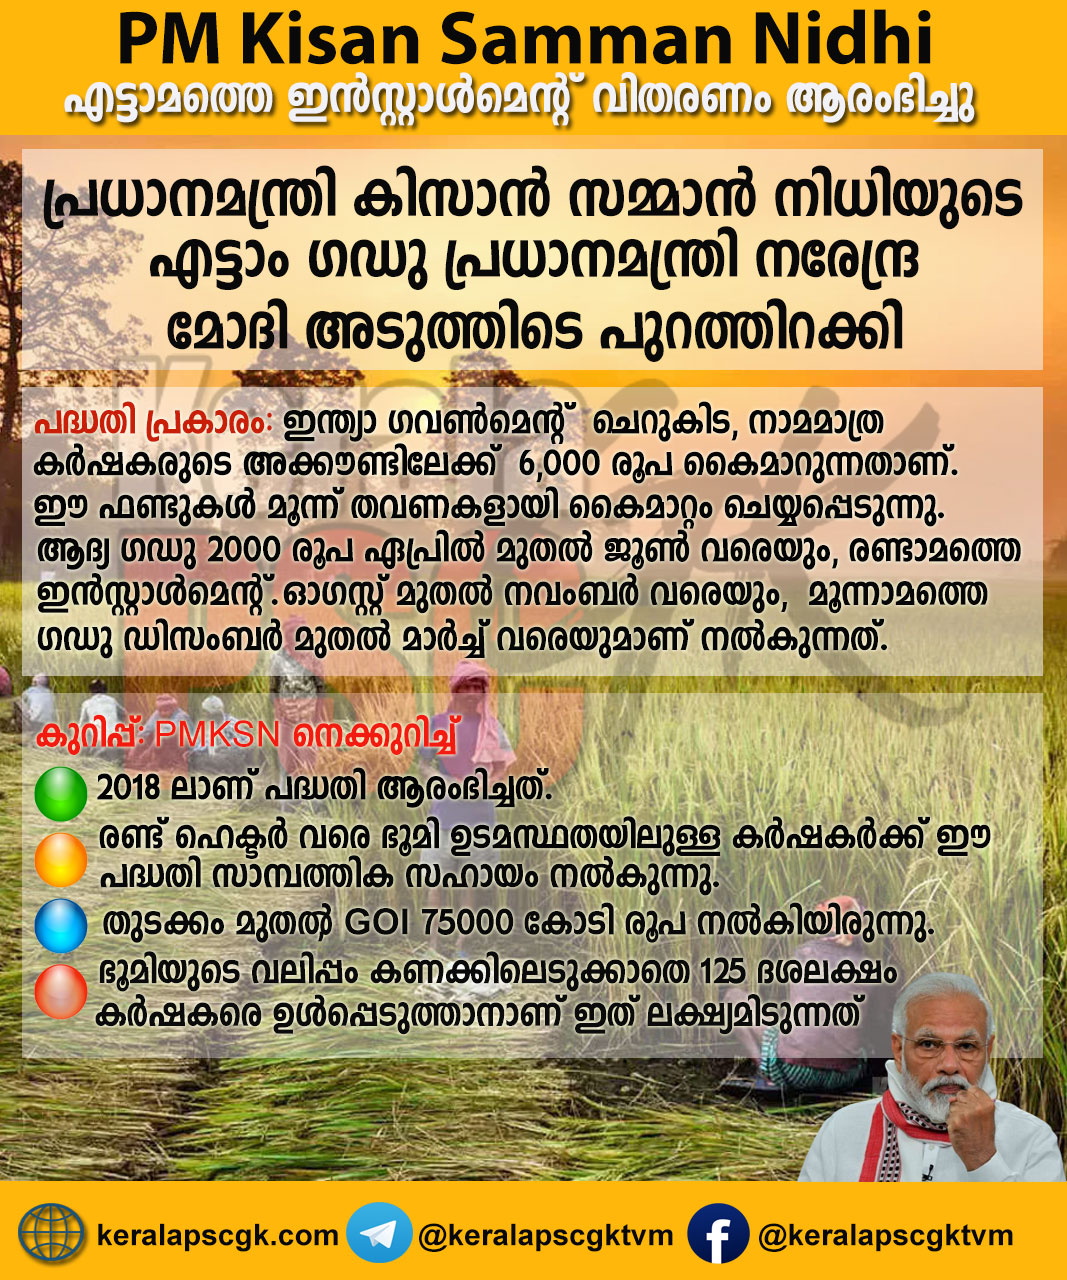 Eighth Instalment released PM Kisan Samman Nidhi